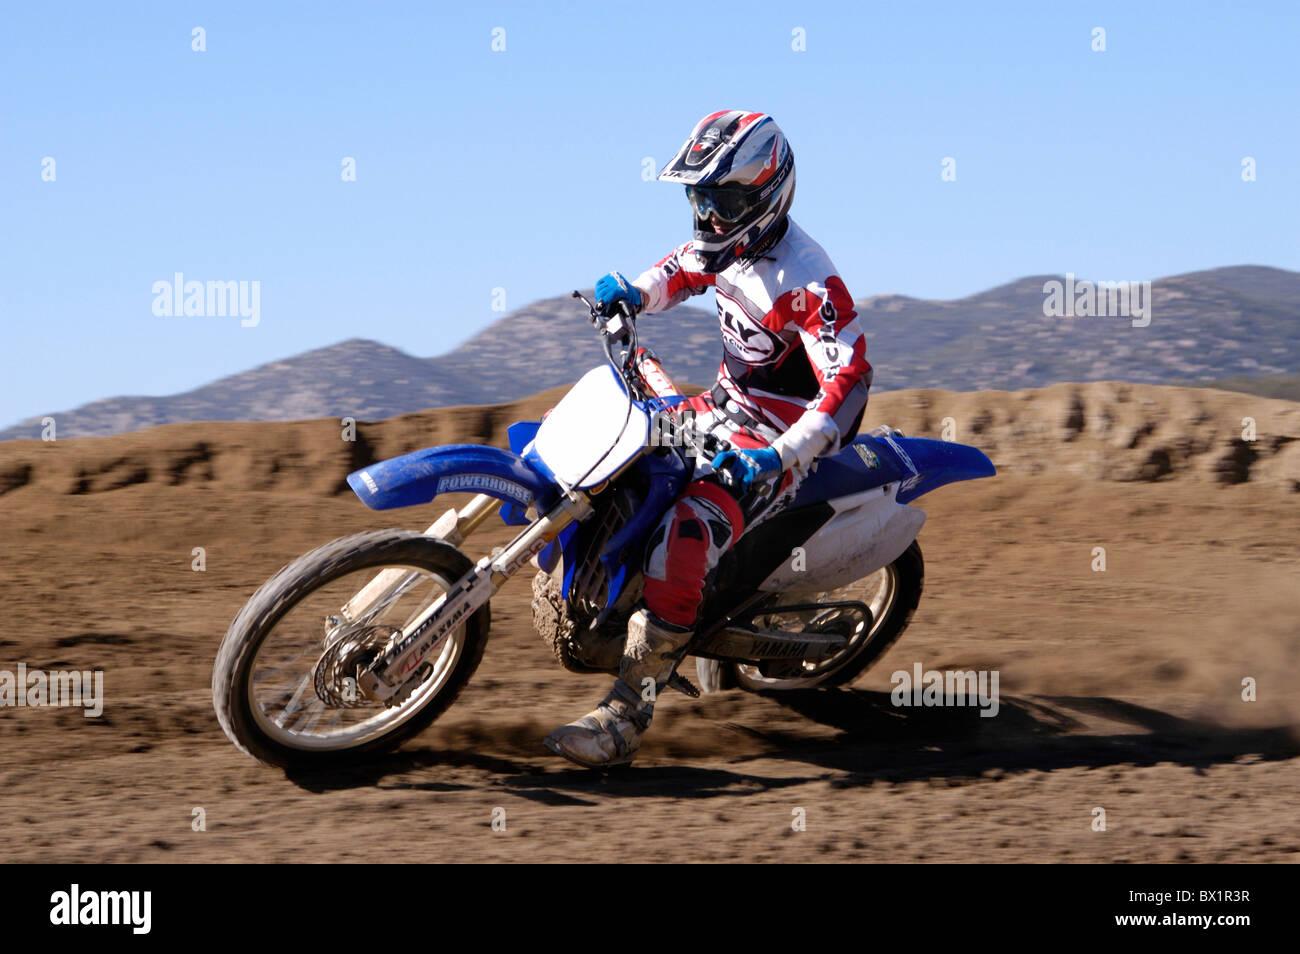 Moto cross action motor sport moto sport moto course Photo Stock